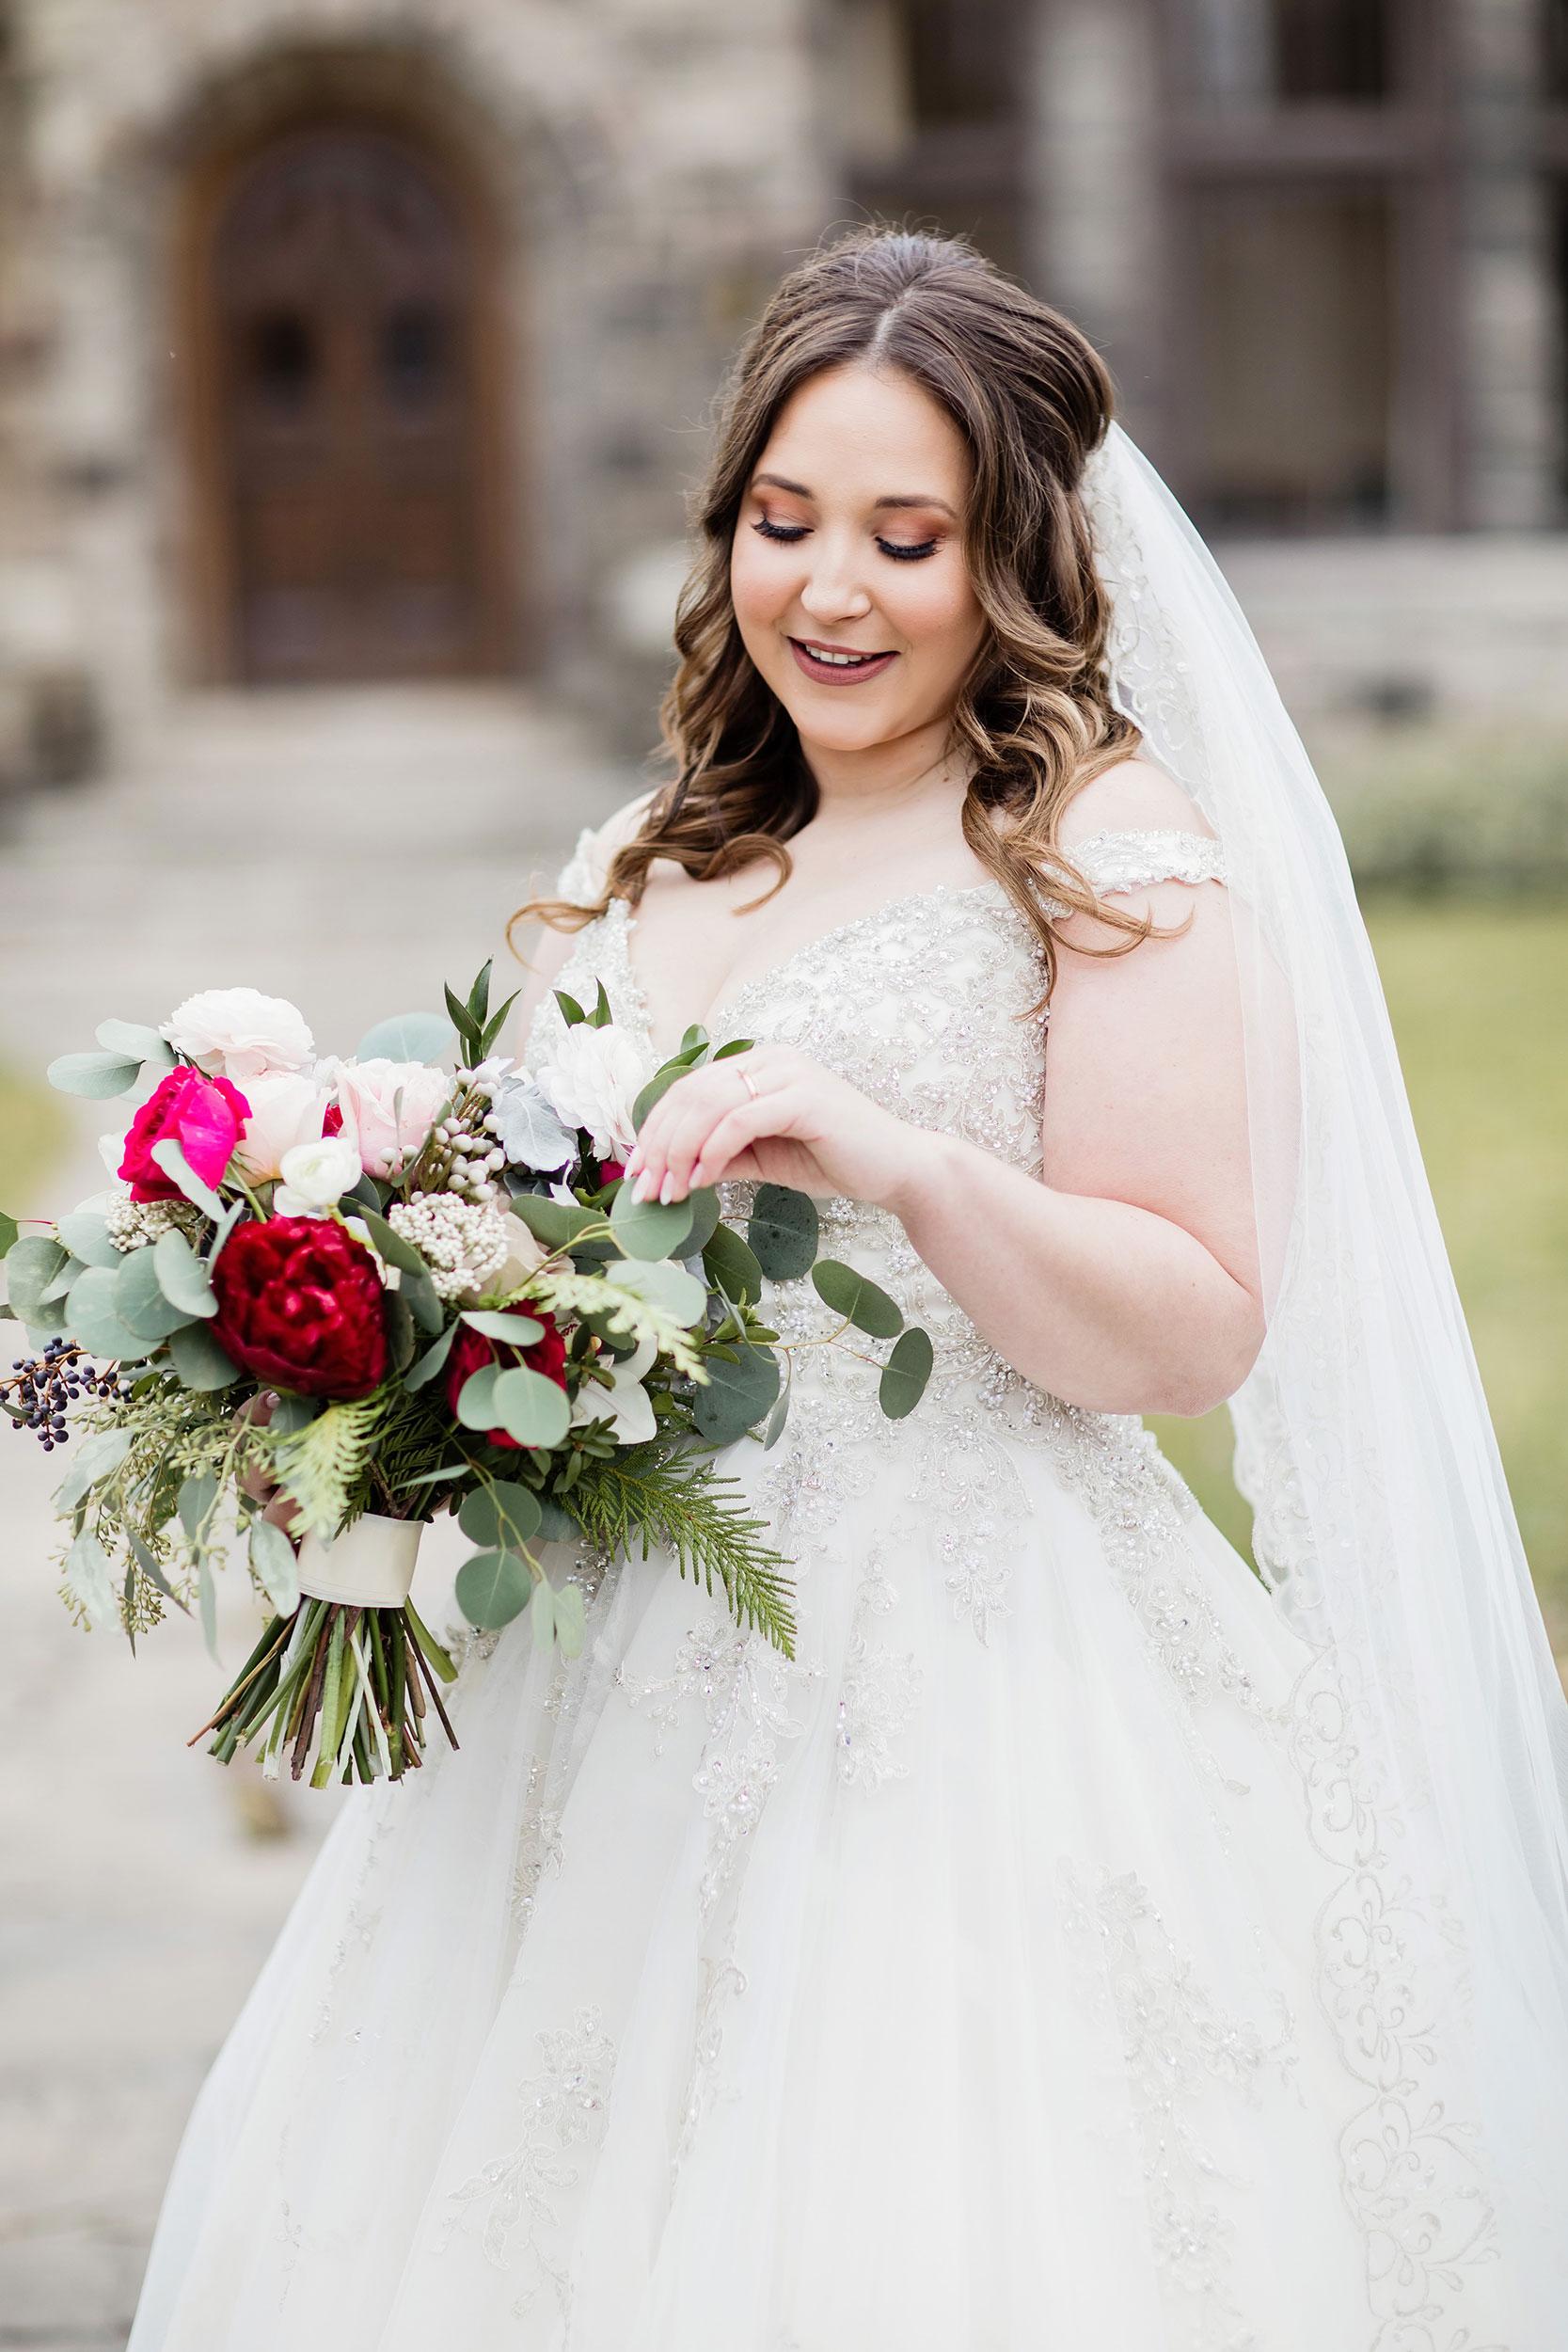 stylish-wedding-photography-windsor-toronto-ontario-wedding-photographer-augustus-27-caesars-eryn-shea-photography-31.JPG